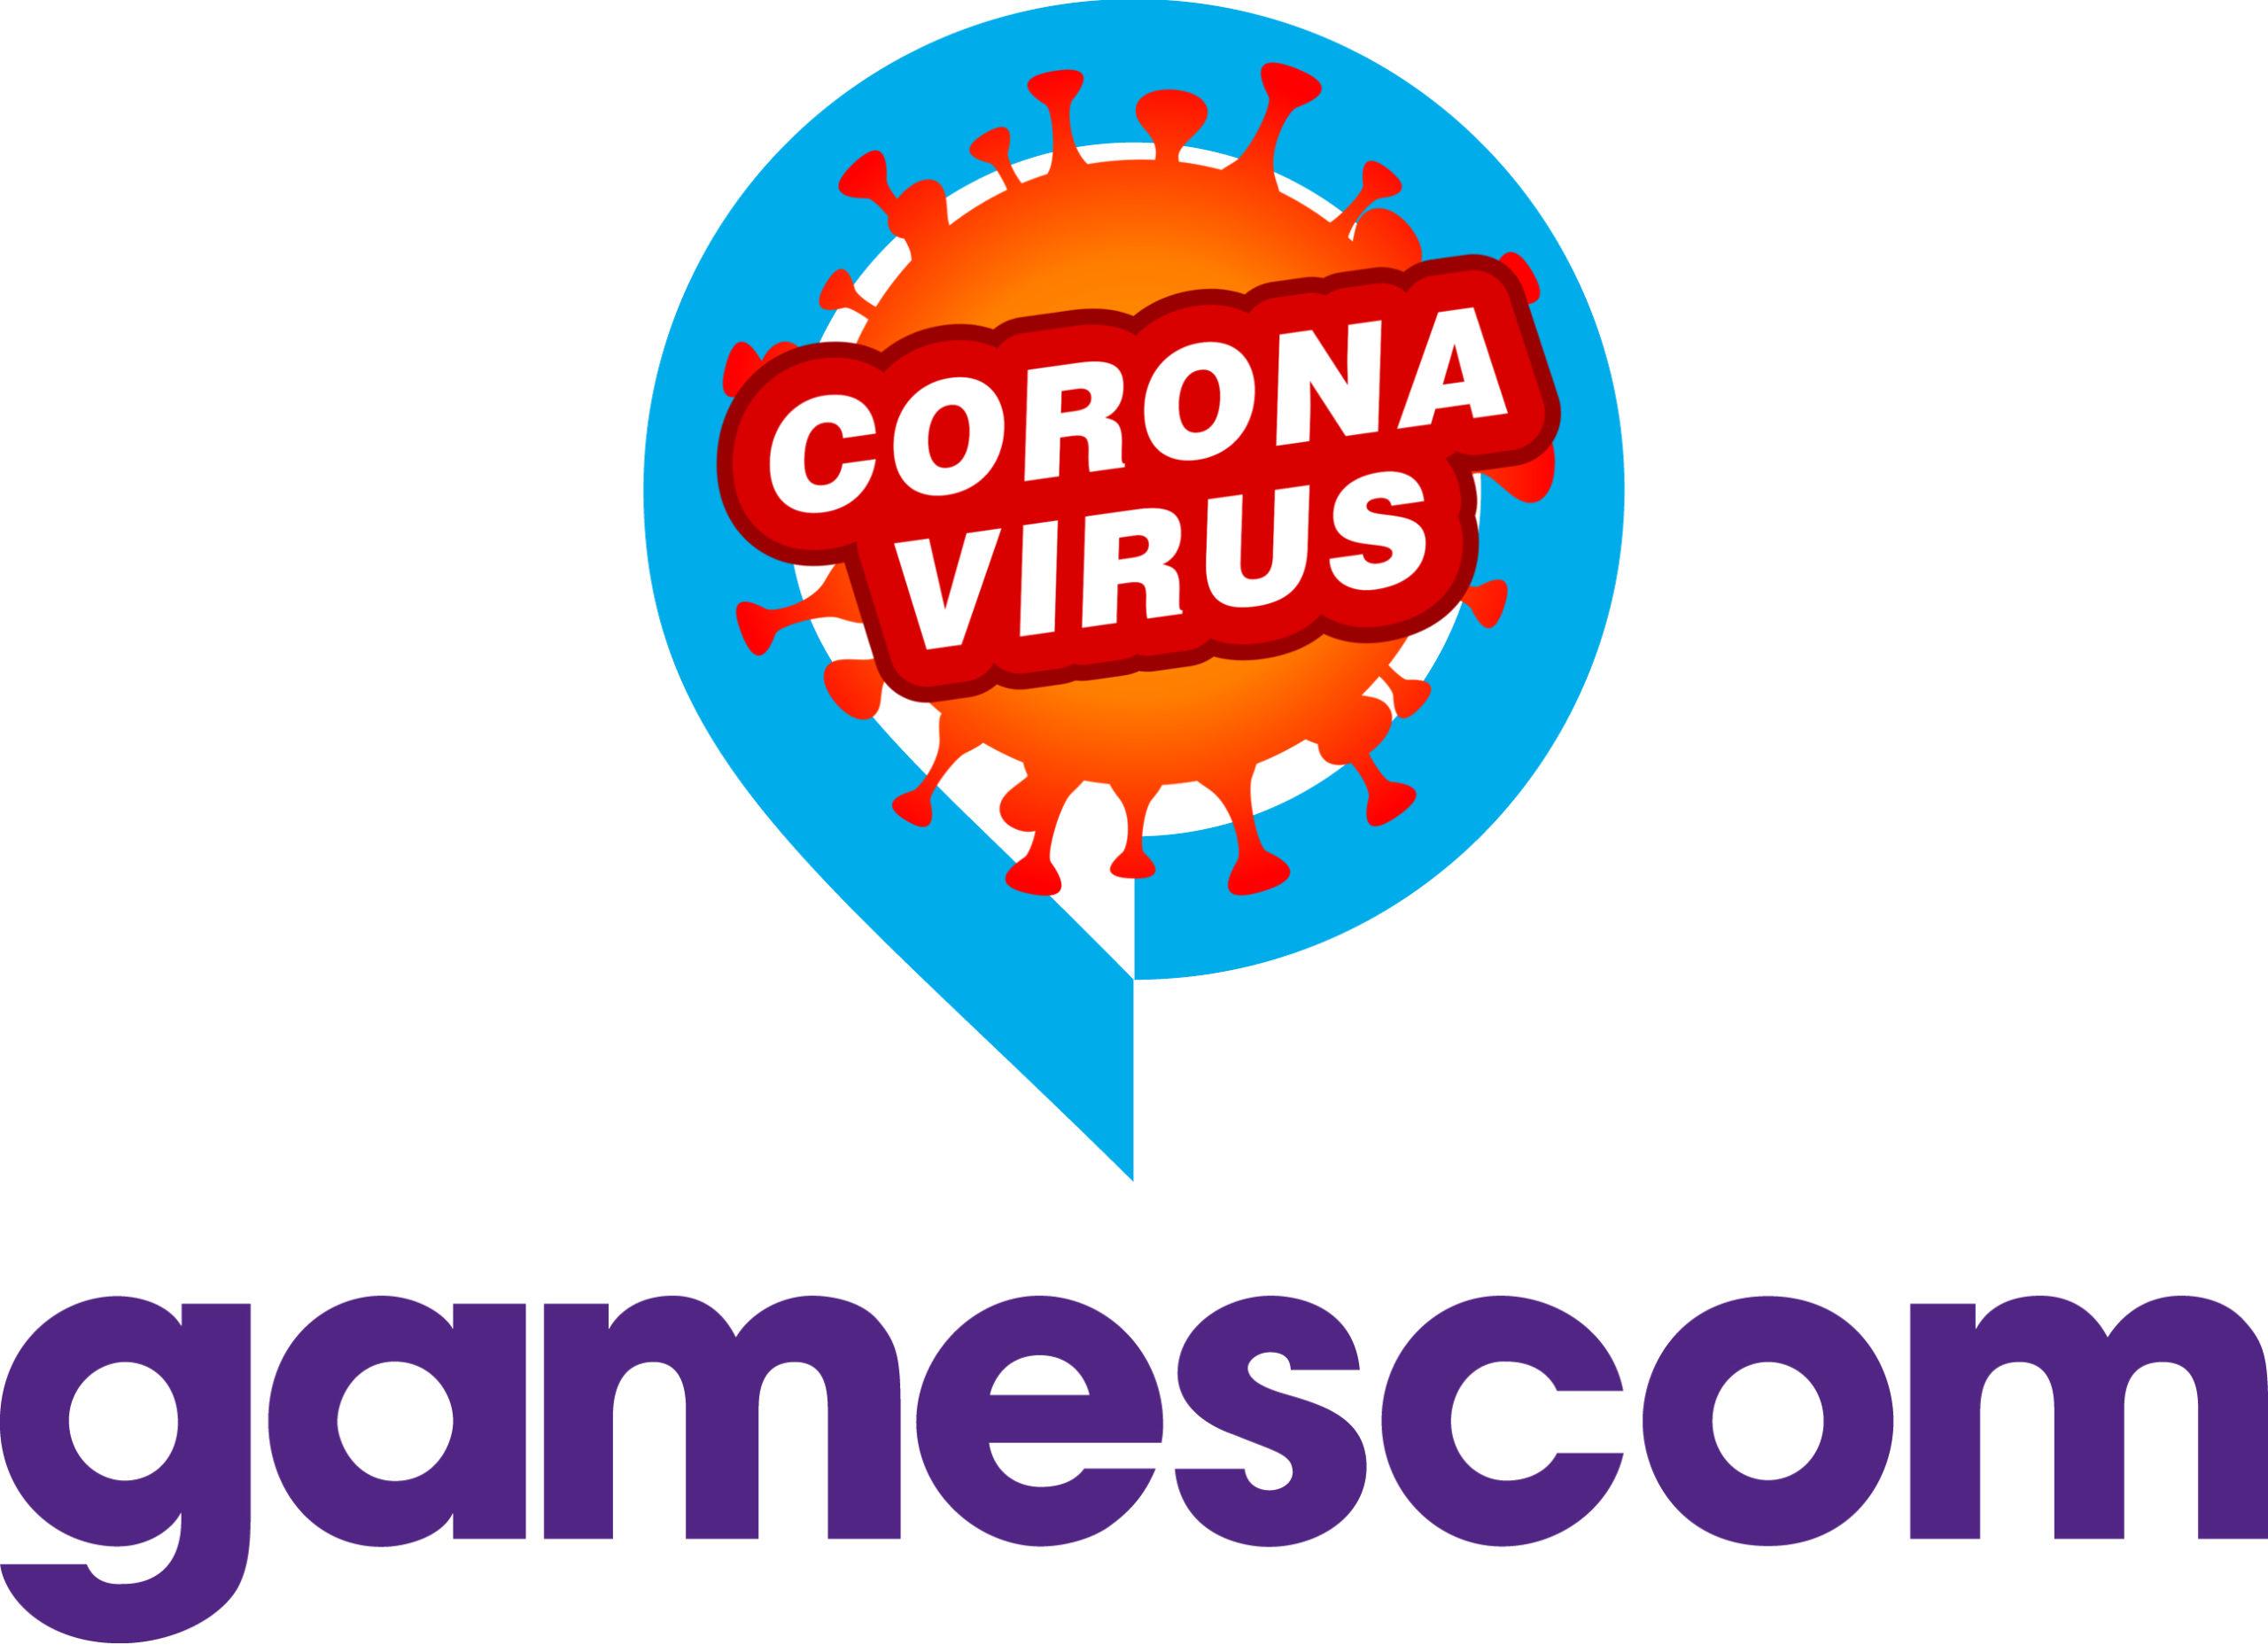 gamescom 2020: Online-Ticket-Shop ist geöffnet